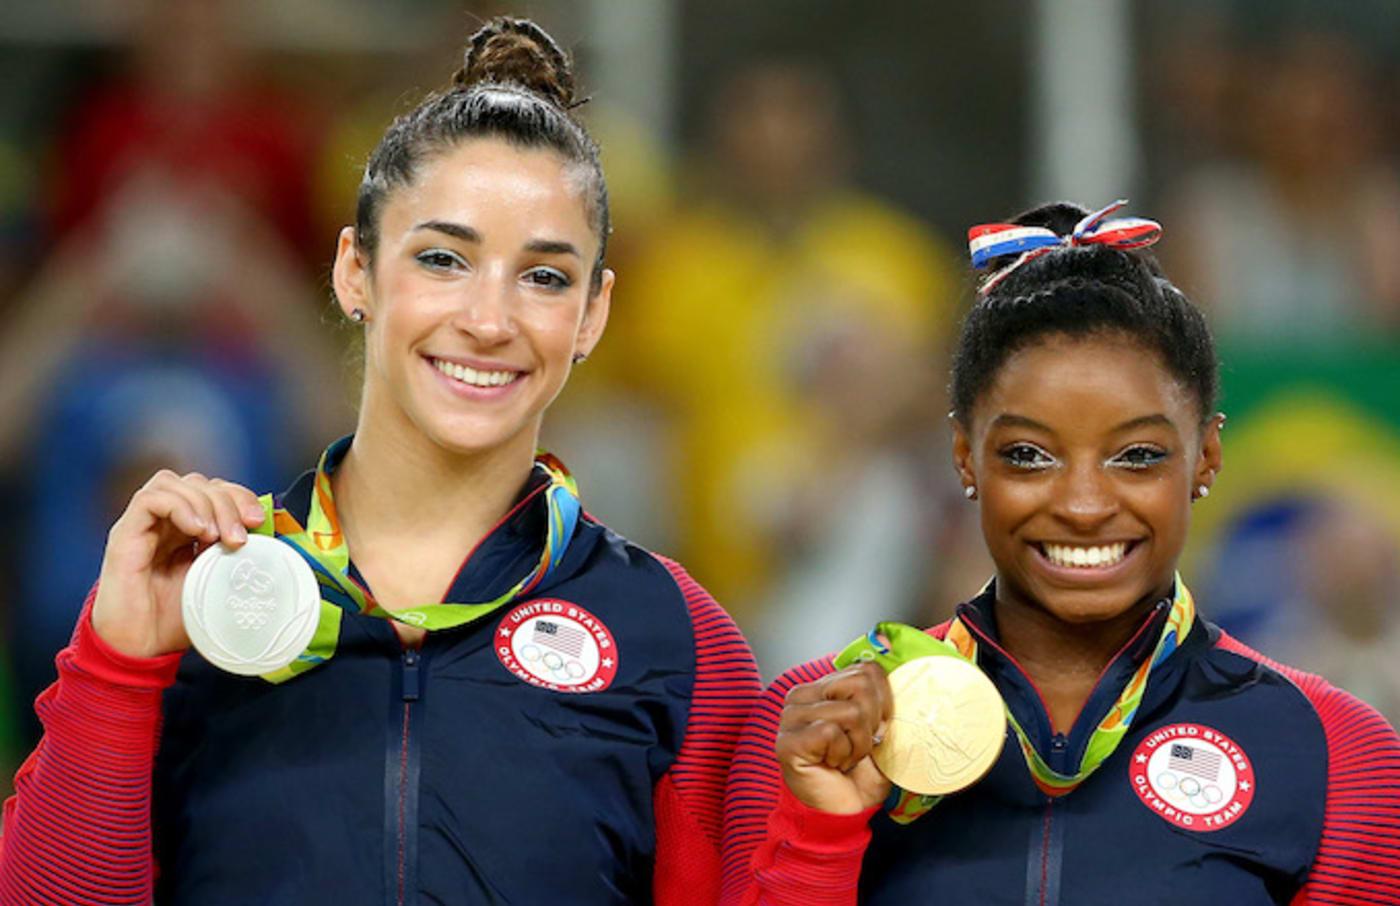 Ali Raisman and Simone Biles at the Rio Olympics.